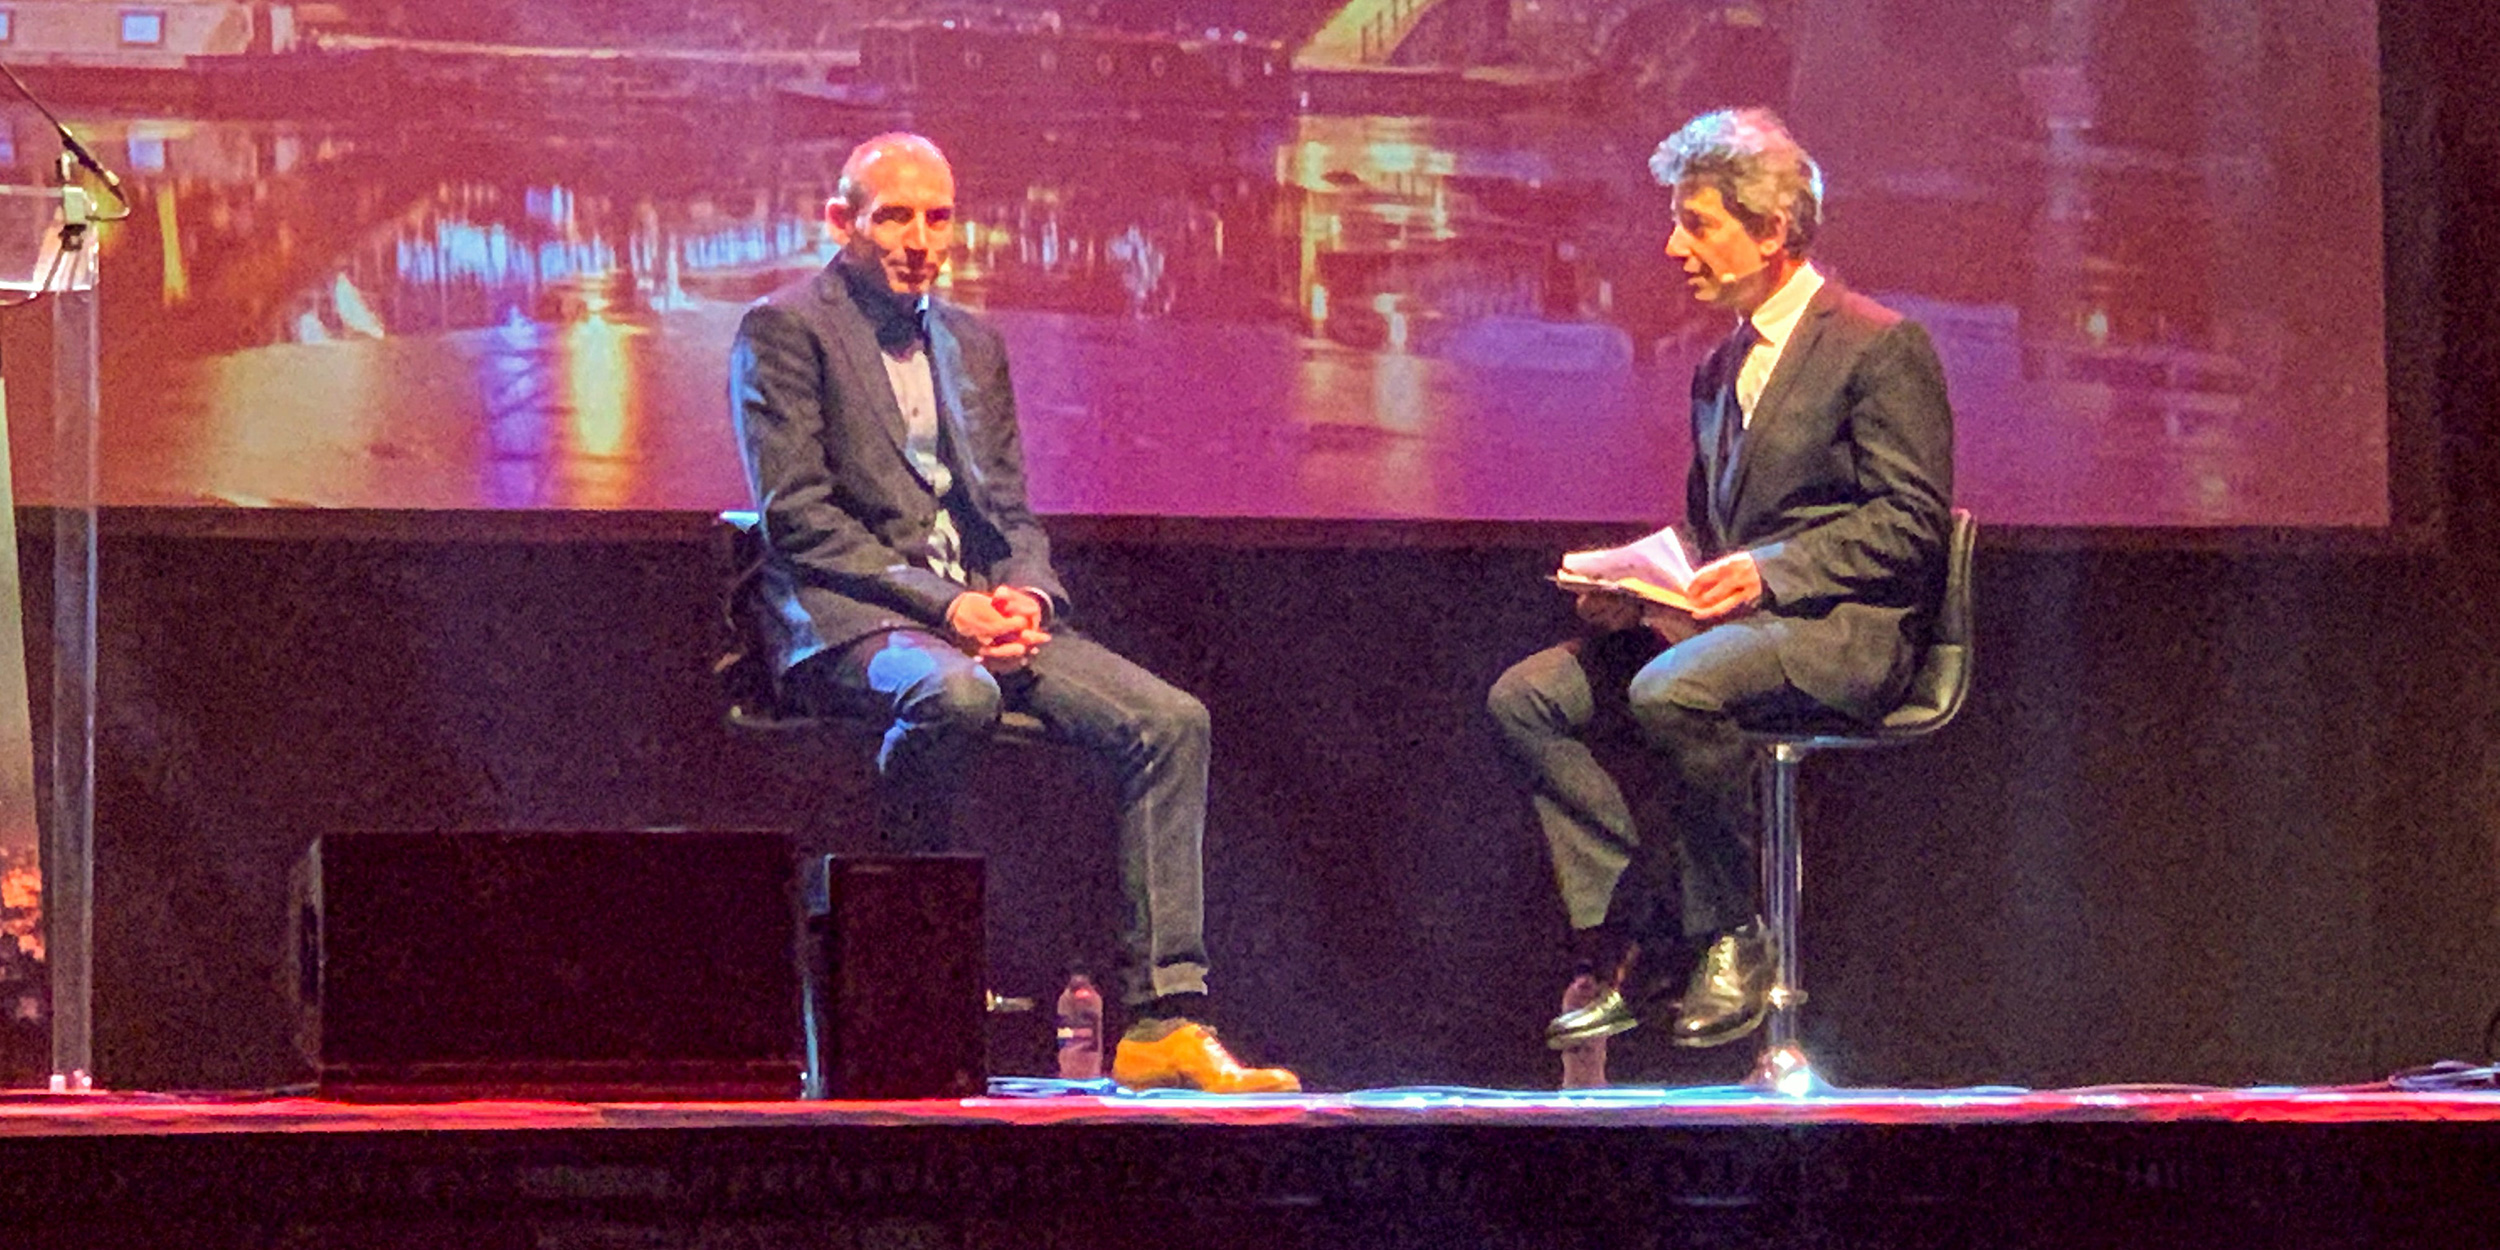 David Moss and David Rowan at the Northern Tech Awards 2019